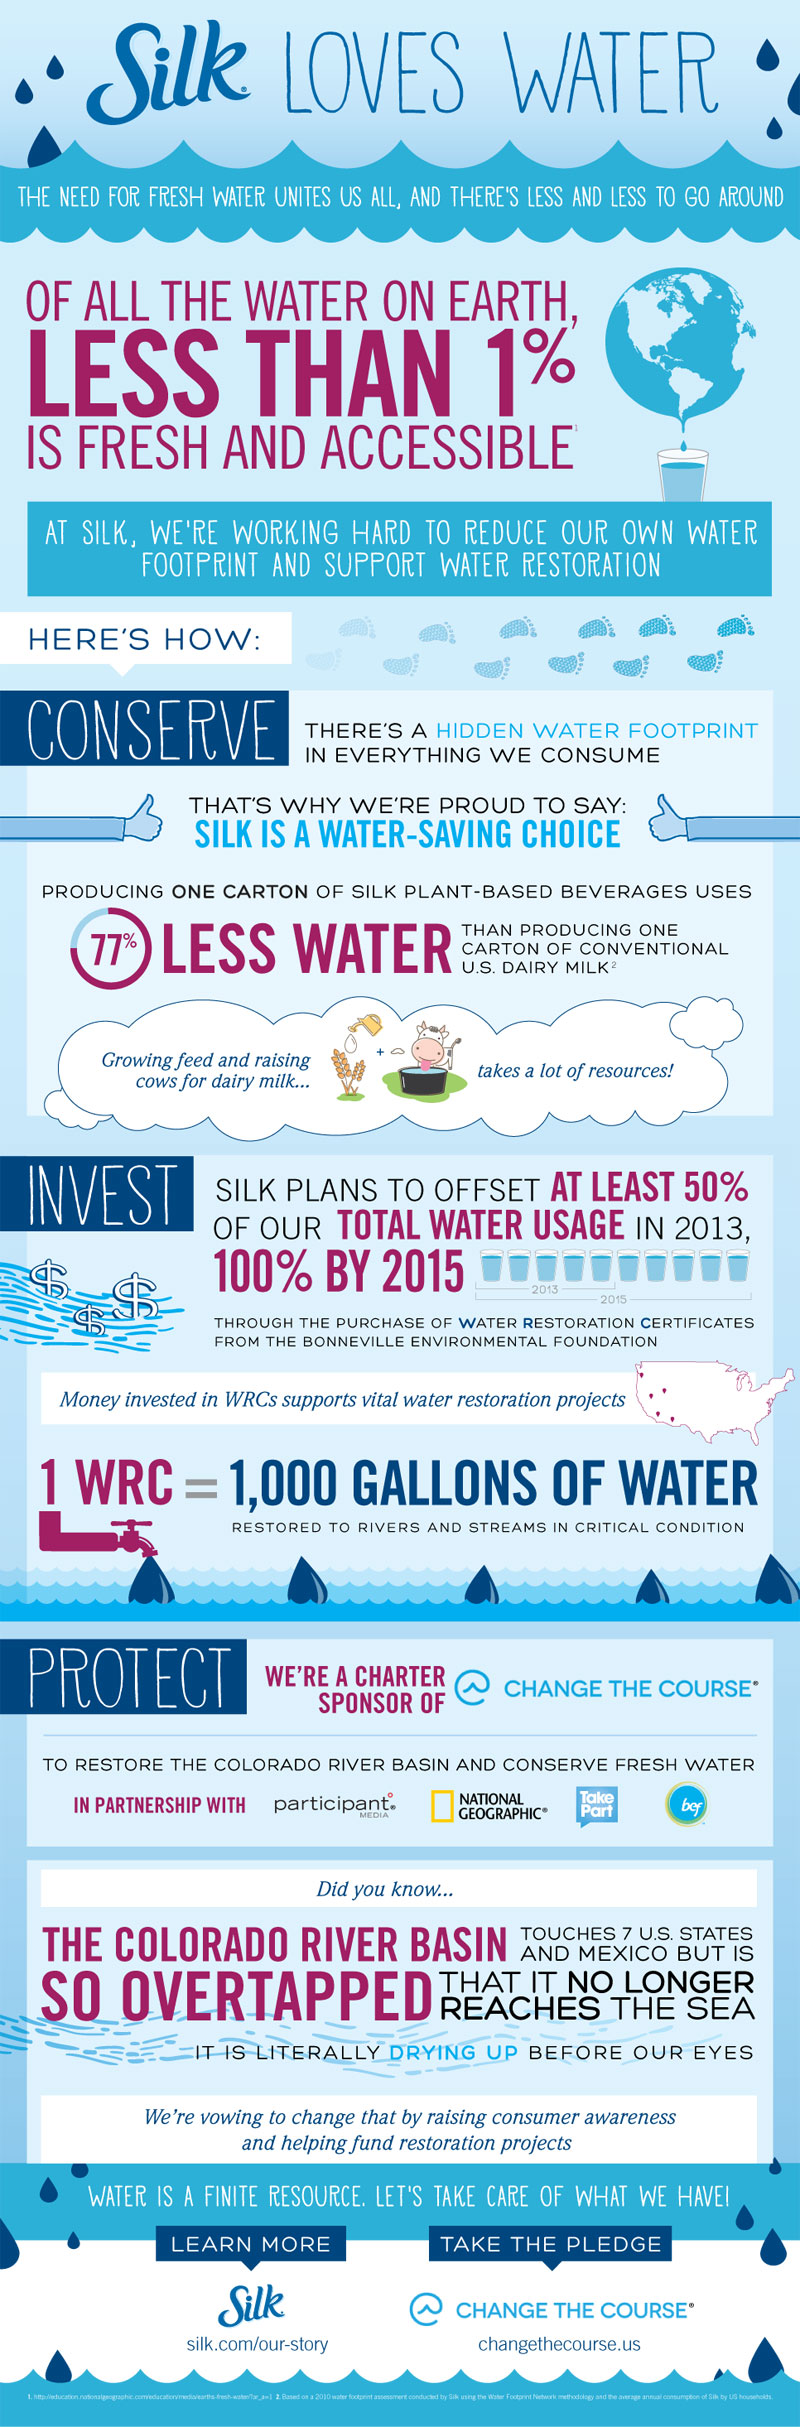 Silk_Water_Infographic.jpg